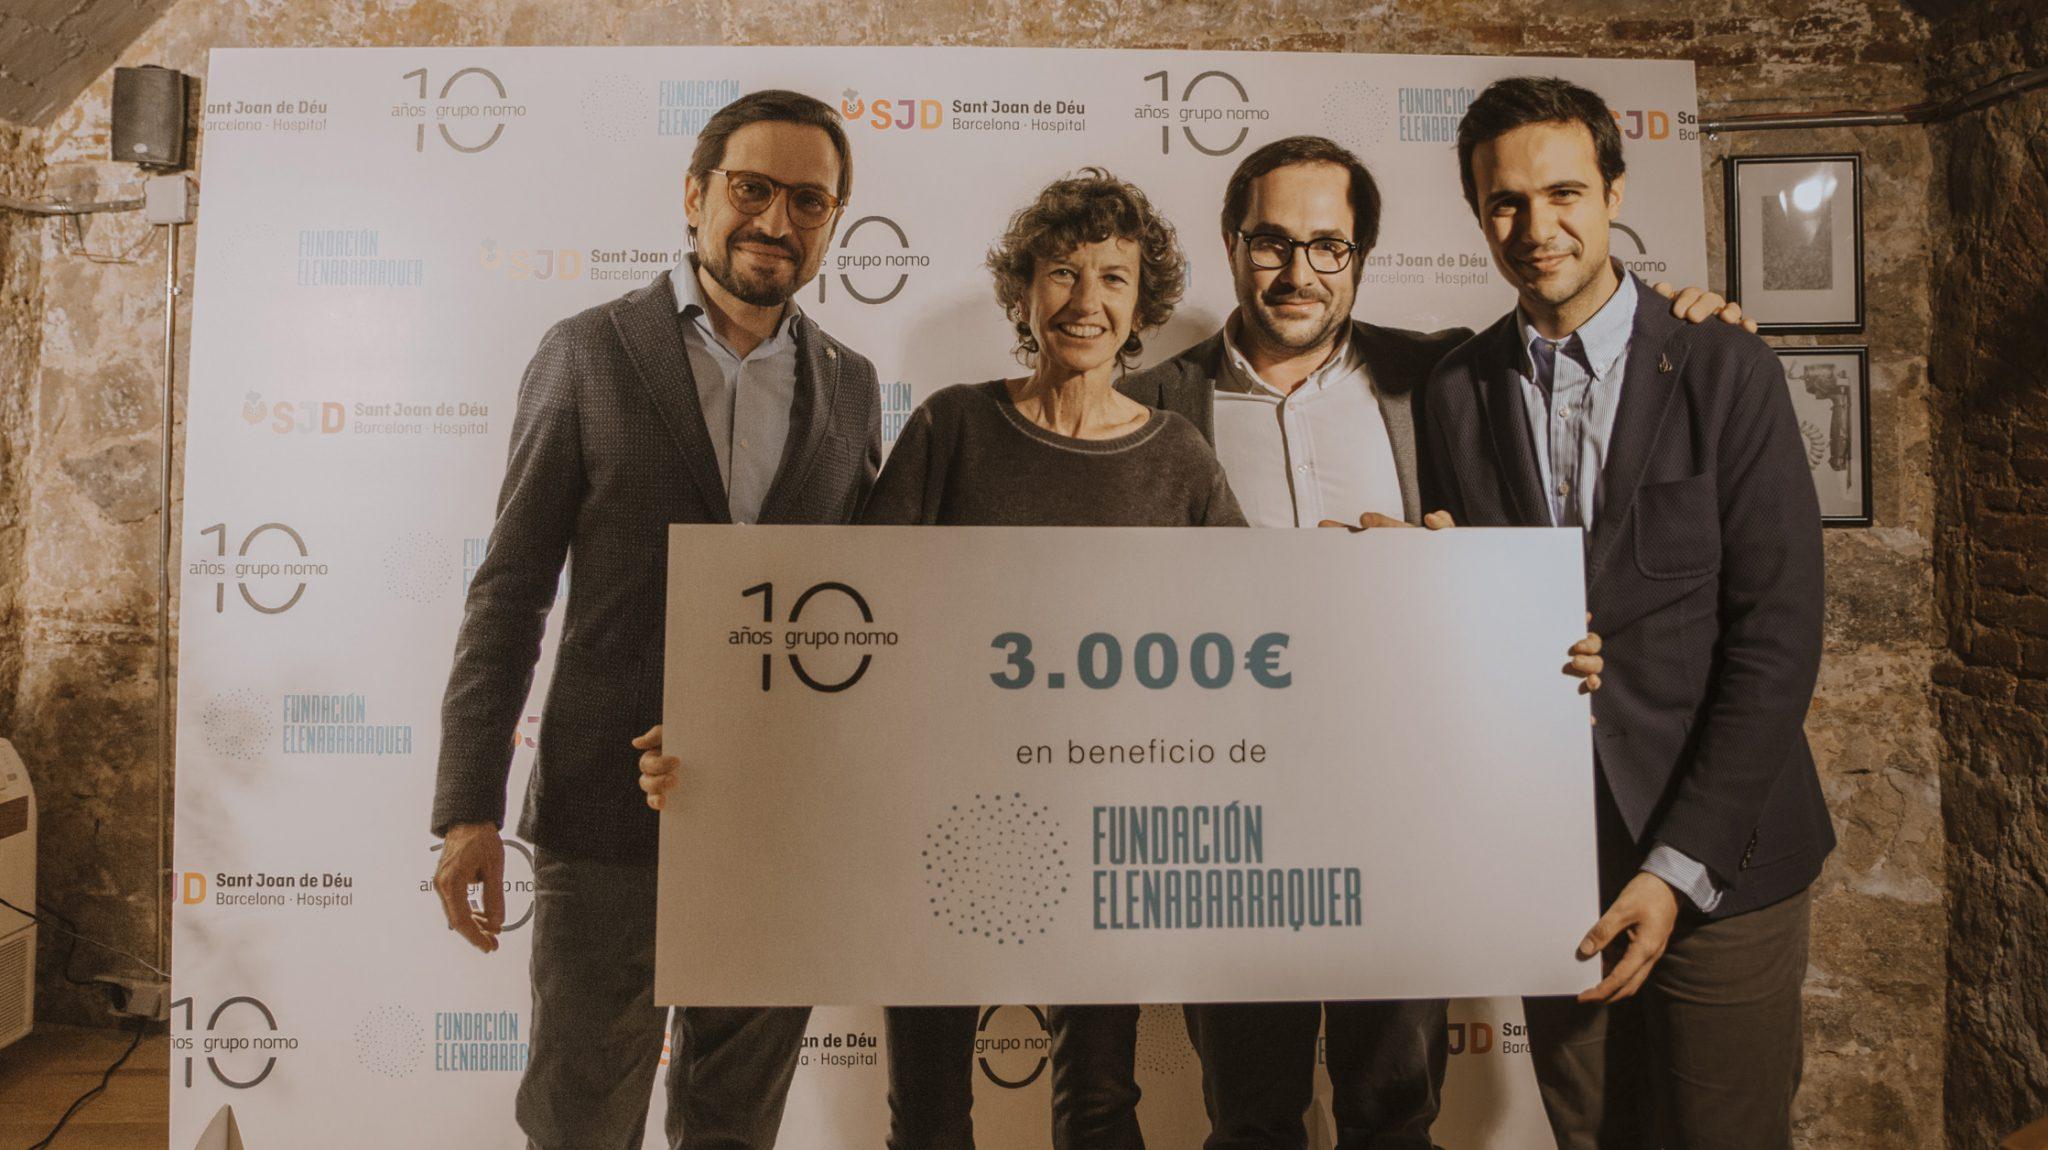 Grupo Nomo dona 7.500€ a causas benéficas